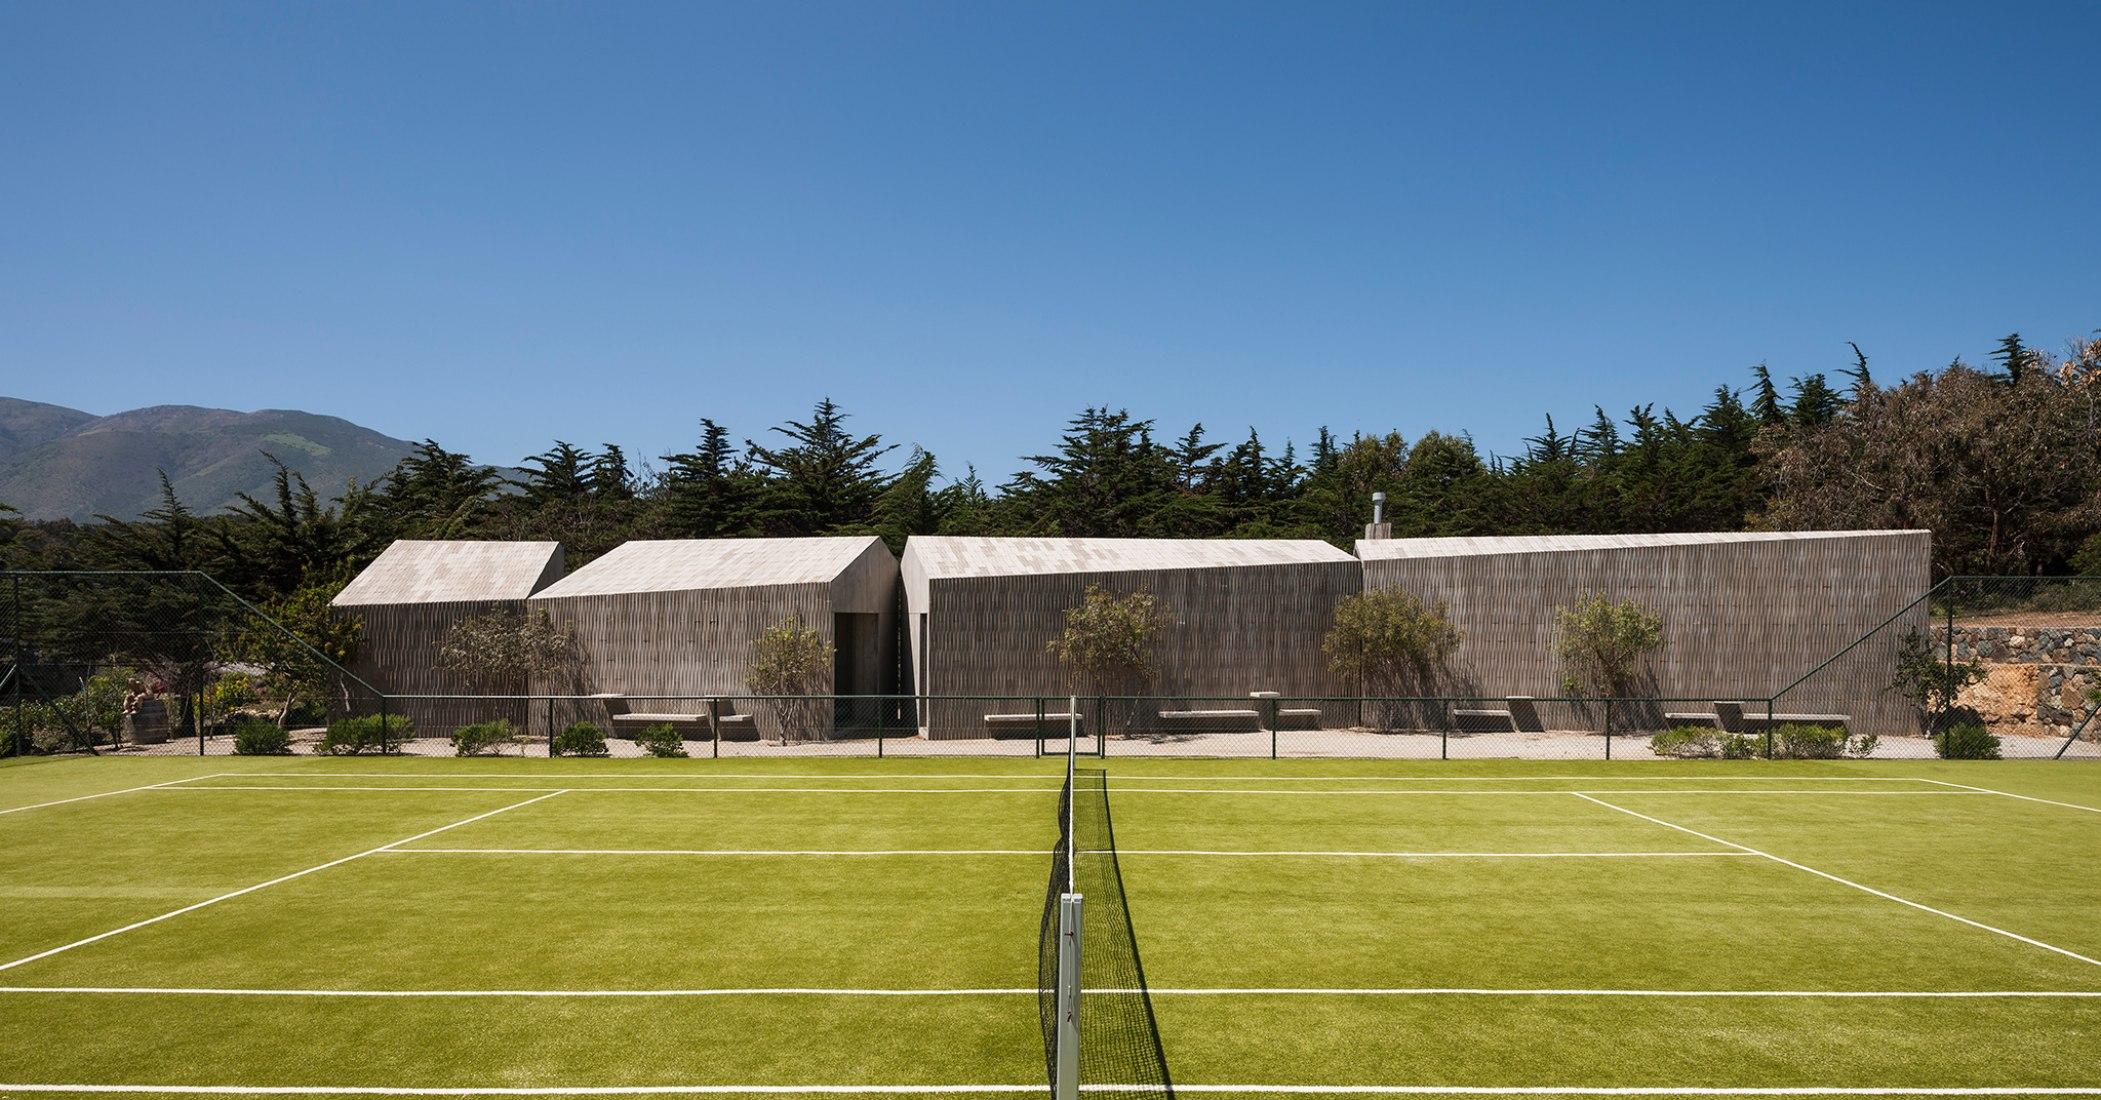 Bahía Azul House, Four Uses Pavilion by Felipe Assadi and Francisca Pulido. Photograph © Fernando Alda